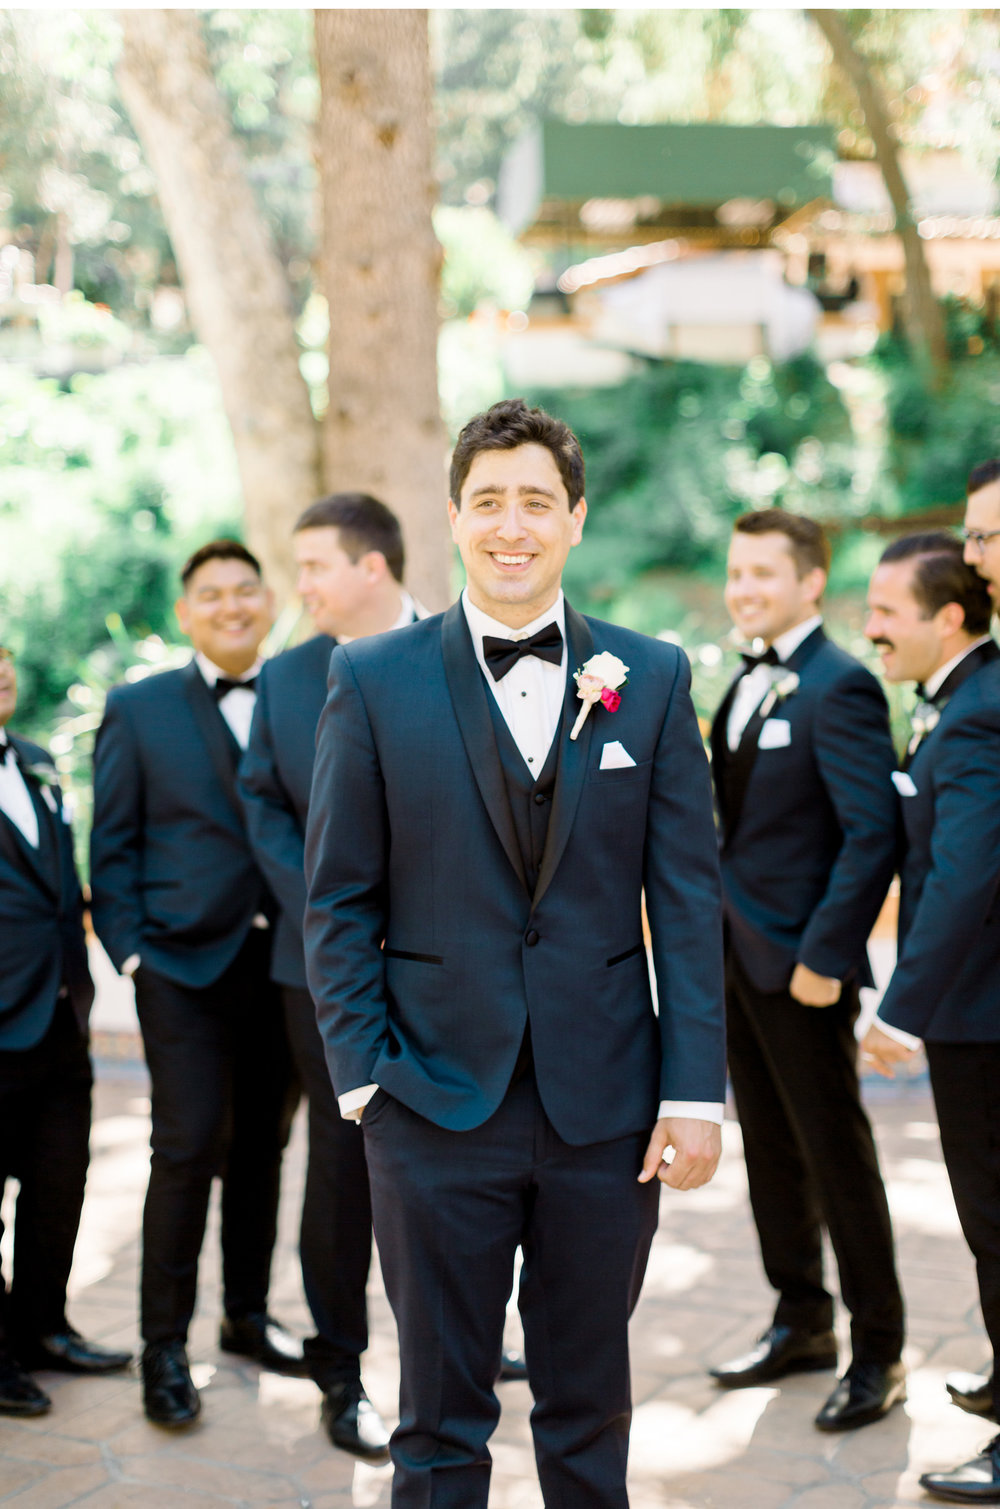 Rancho-Las-Lomas-Style-Me-Pretty-Wedding-Natalie-Schutt-Photography_04.jpg